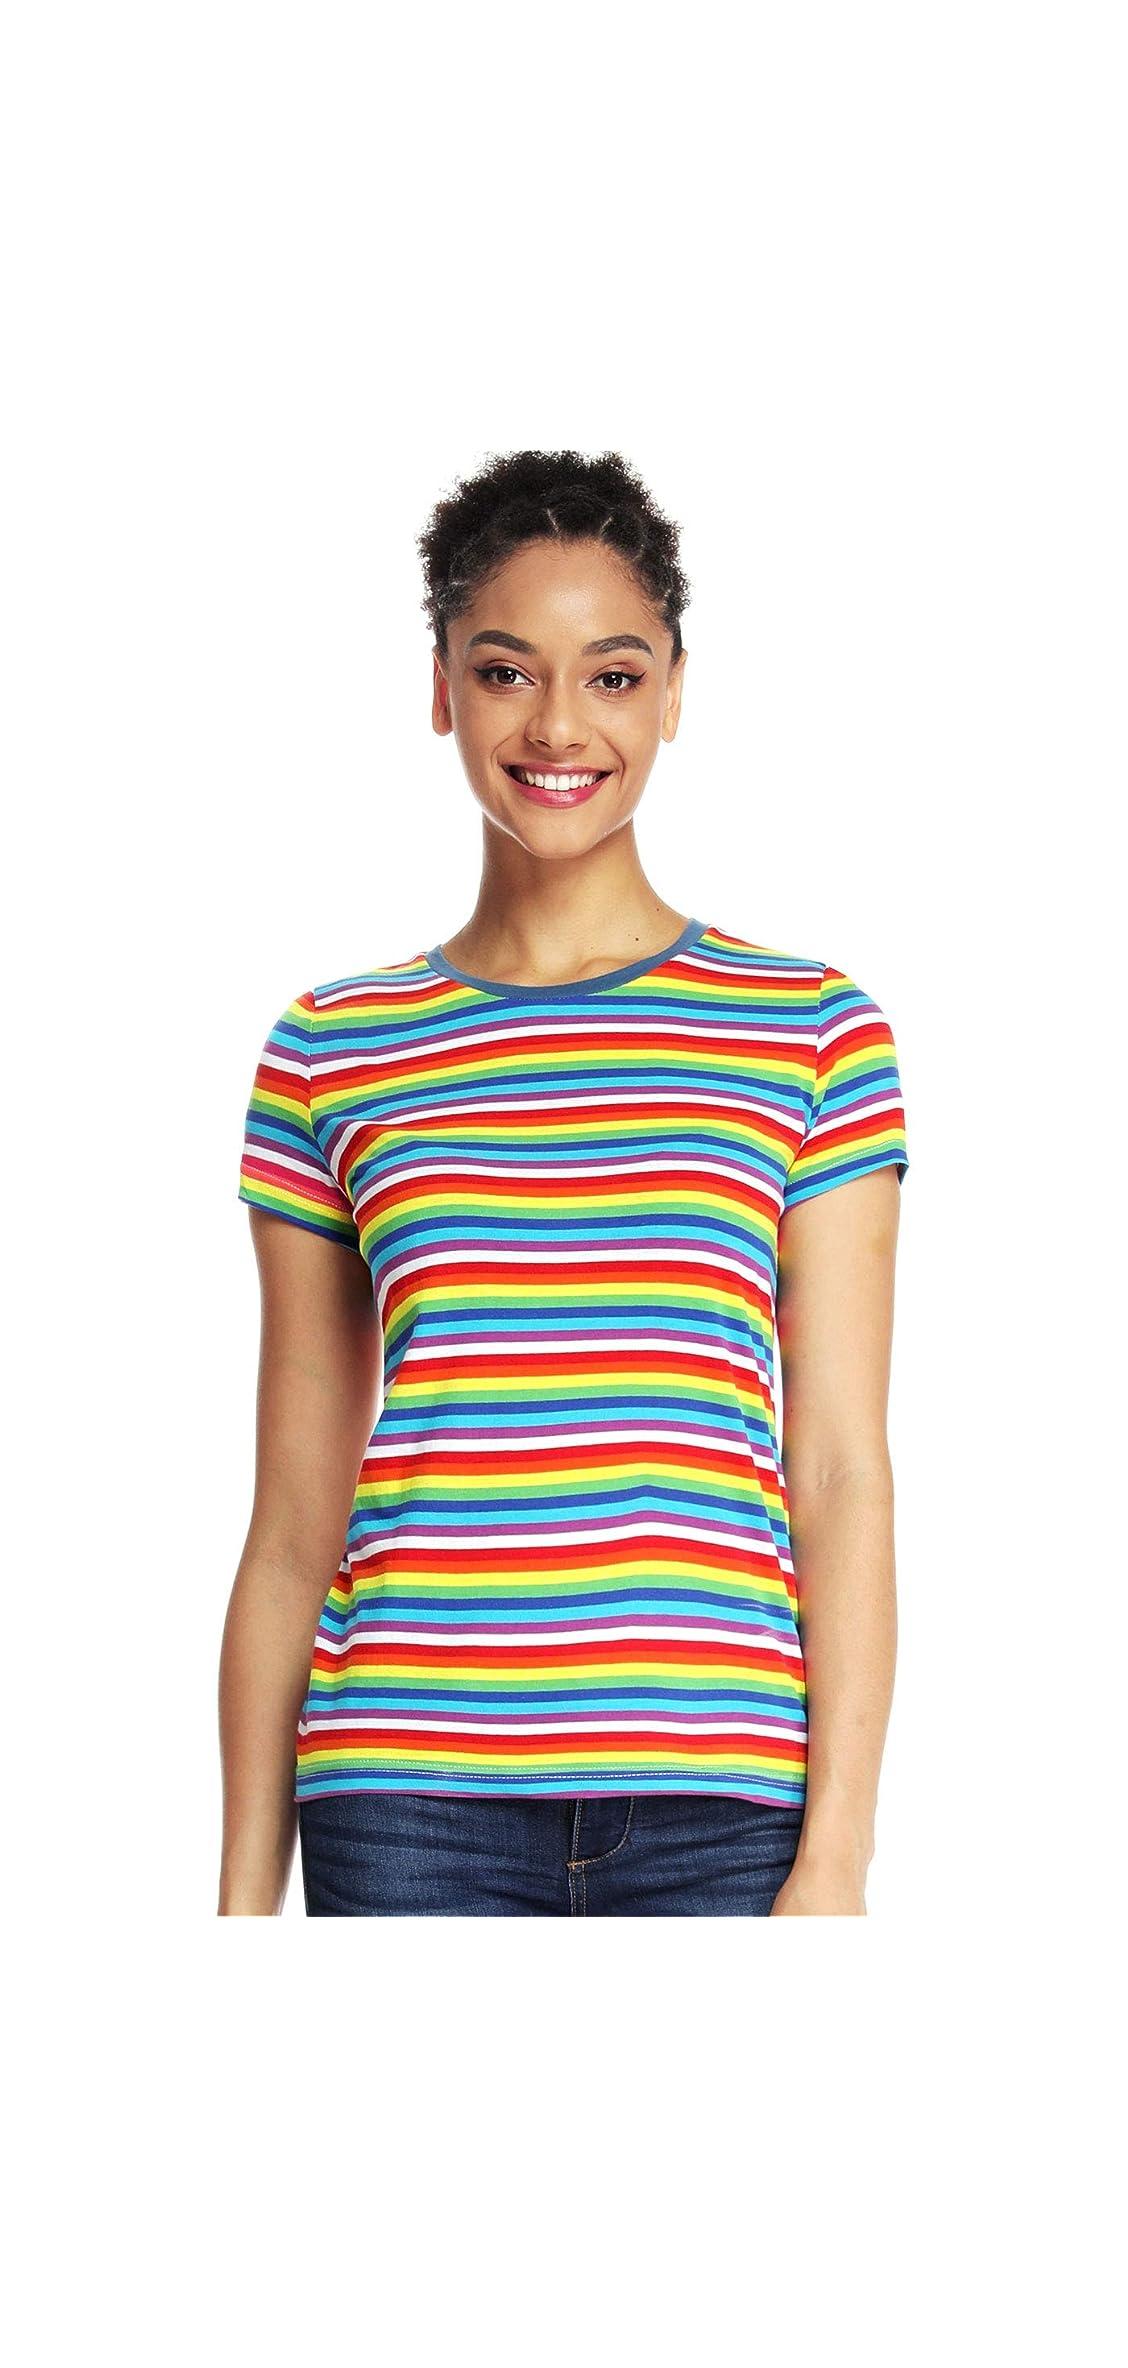 Rainbow T Shirts Women Striped Shirt Crew Neck Stripes Tee Short